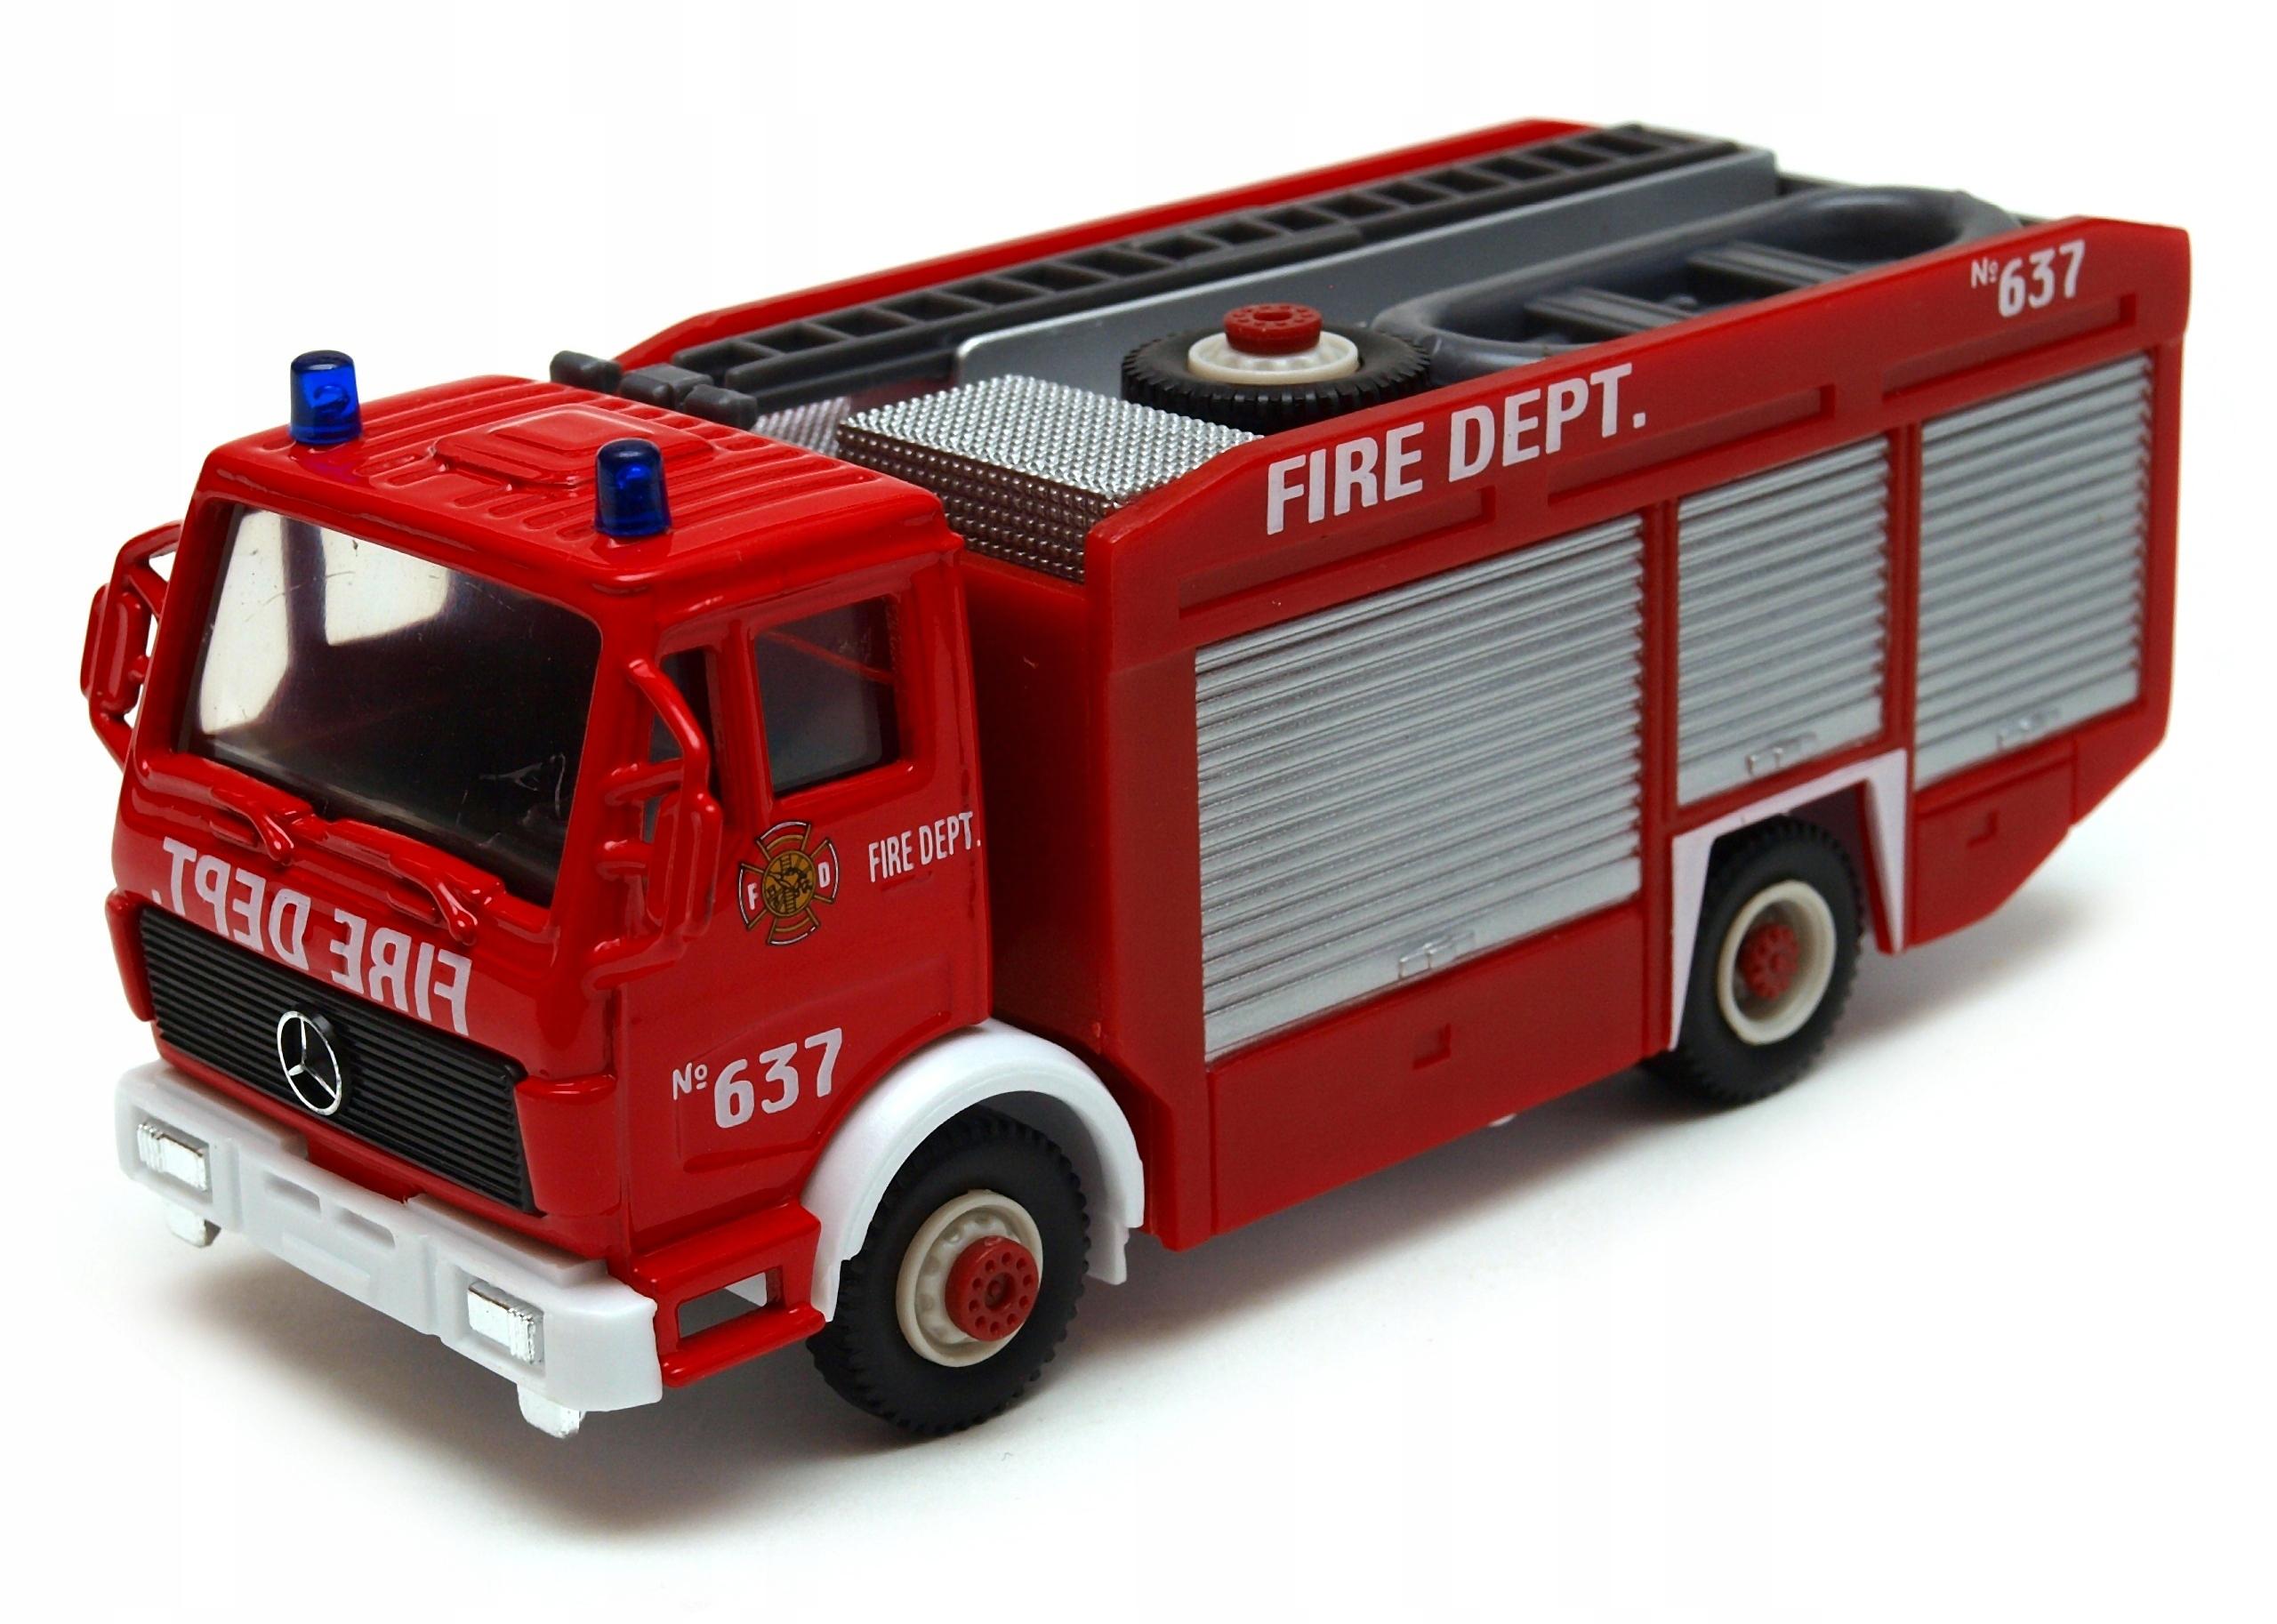 Mercedes-Benz Unimog straż pożarna 1:50 model WELL